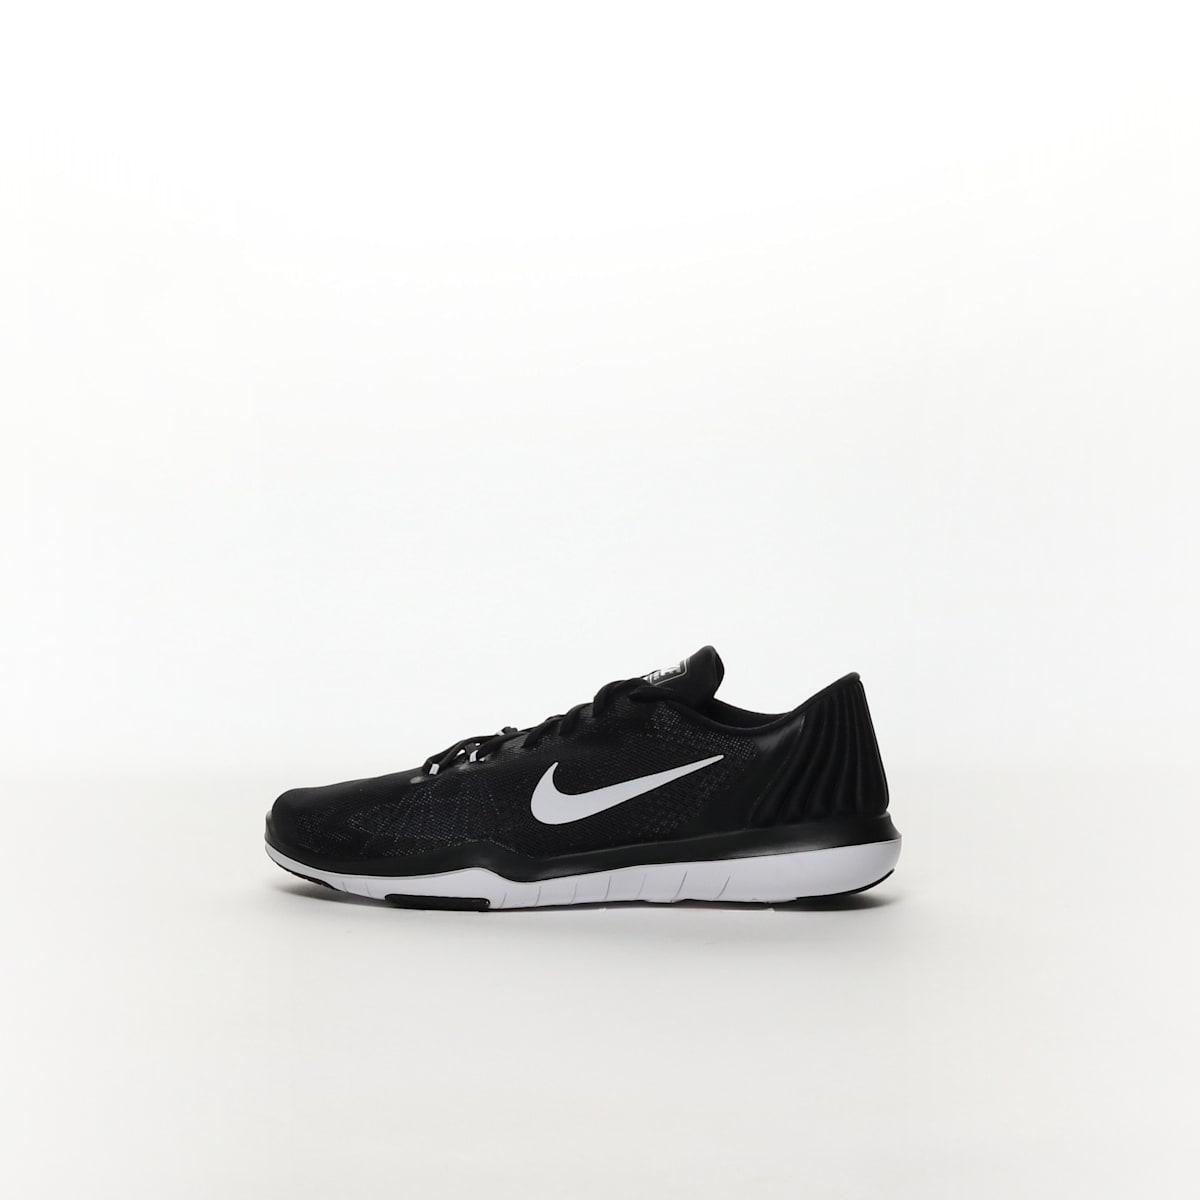 7c6244612f073 Women s Nike Flex Supreme TR 5 Training Shoe - BLACK WHITE – Resku